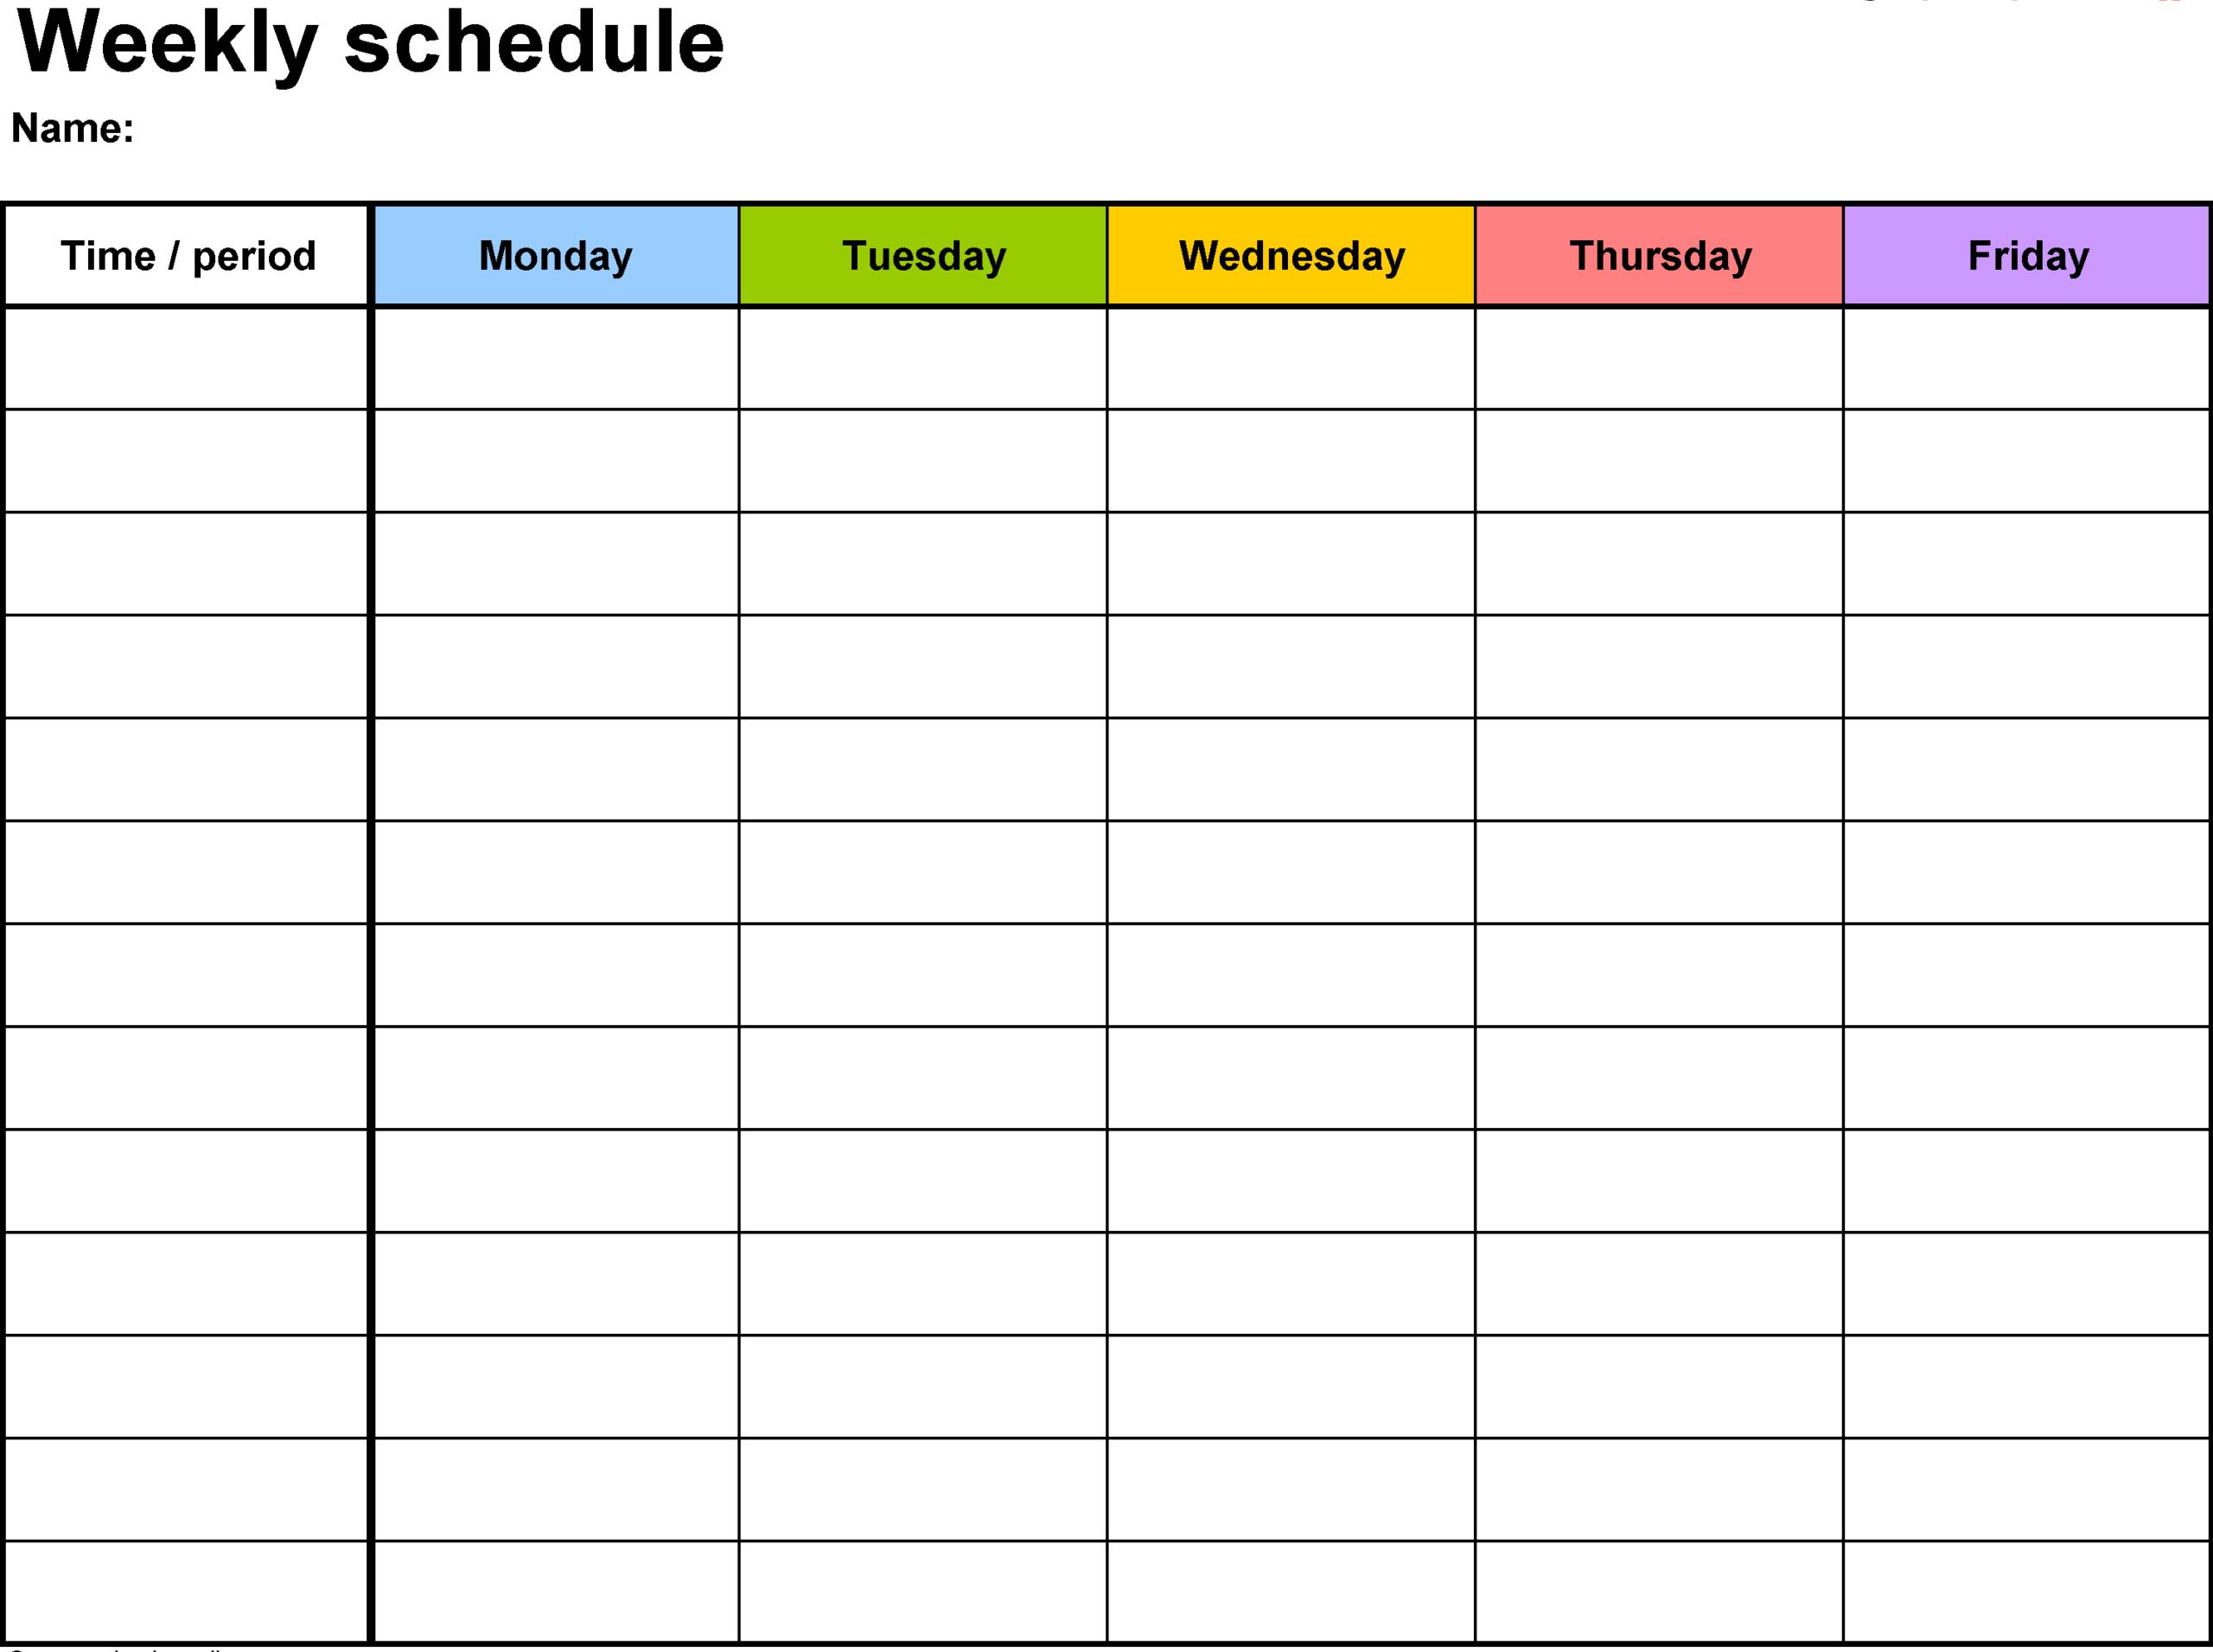 Free Printable Calendar With Time Slots | Calendar pertaining to Printable Calendar With Time Slots